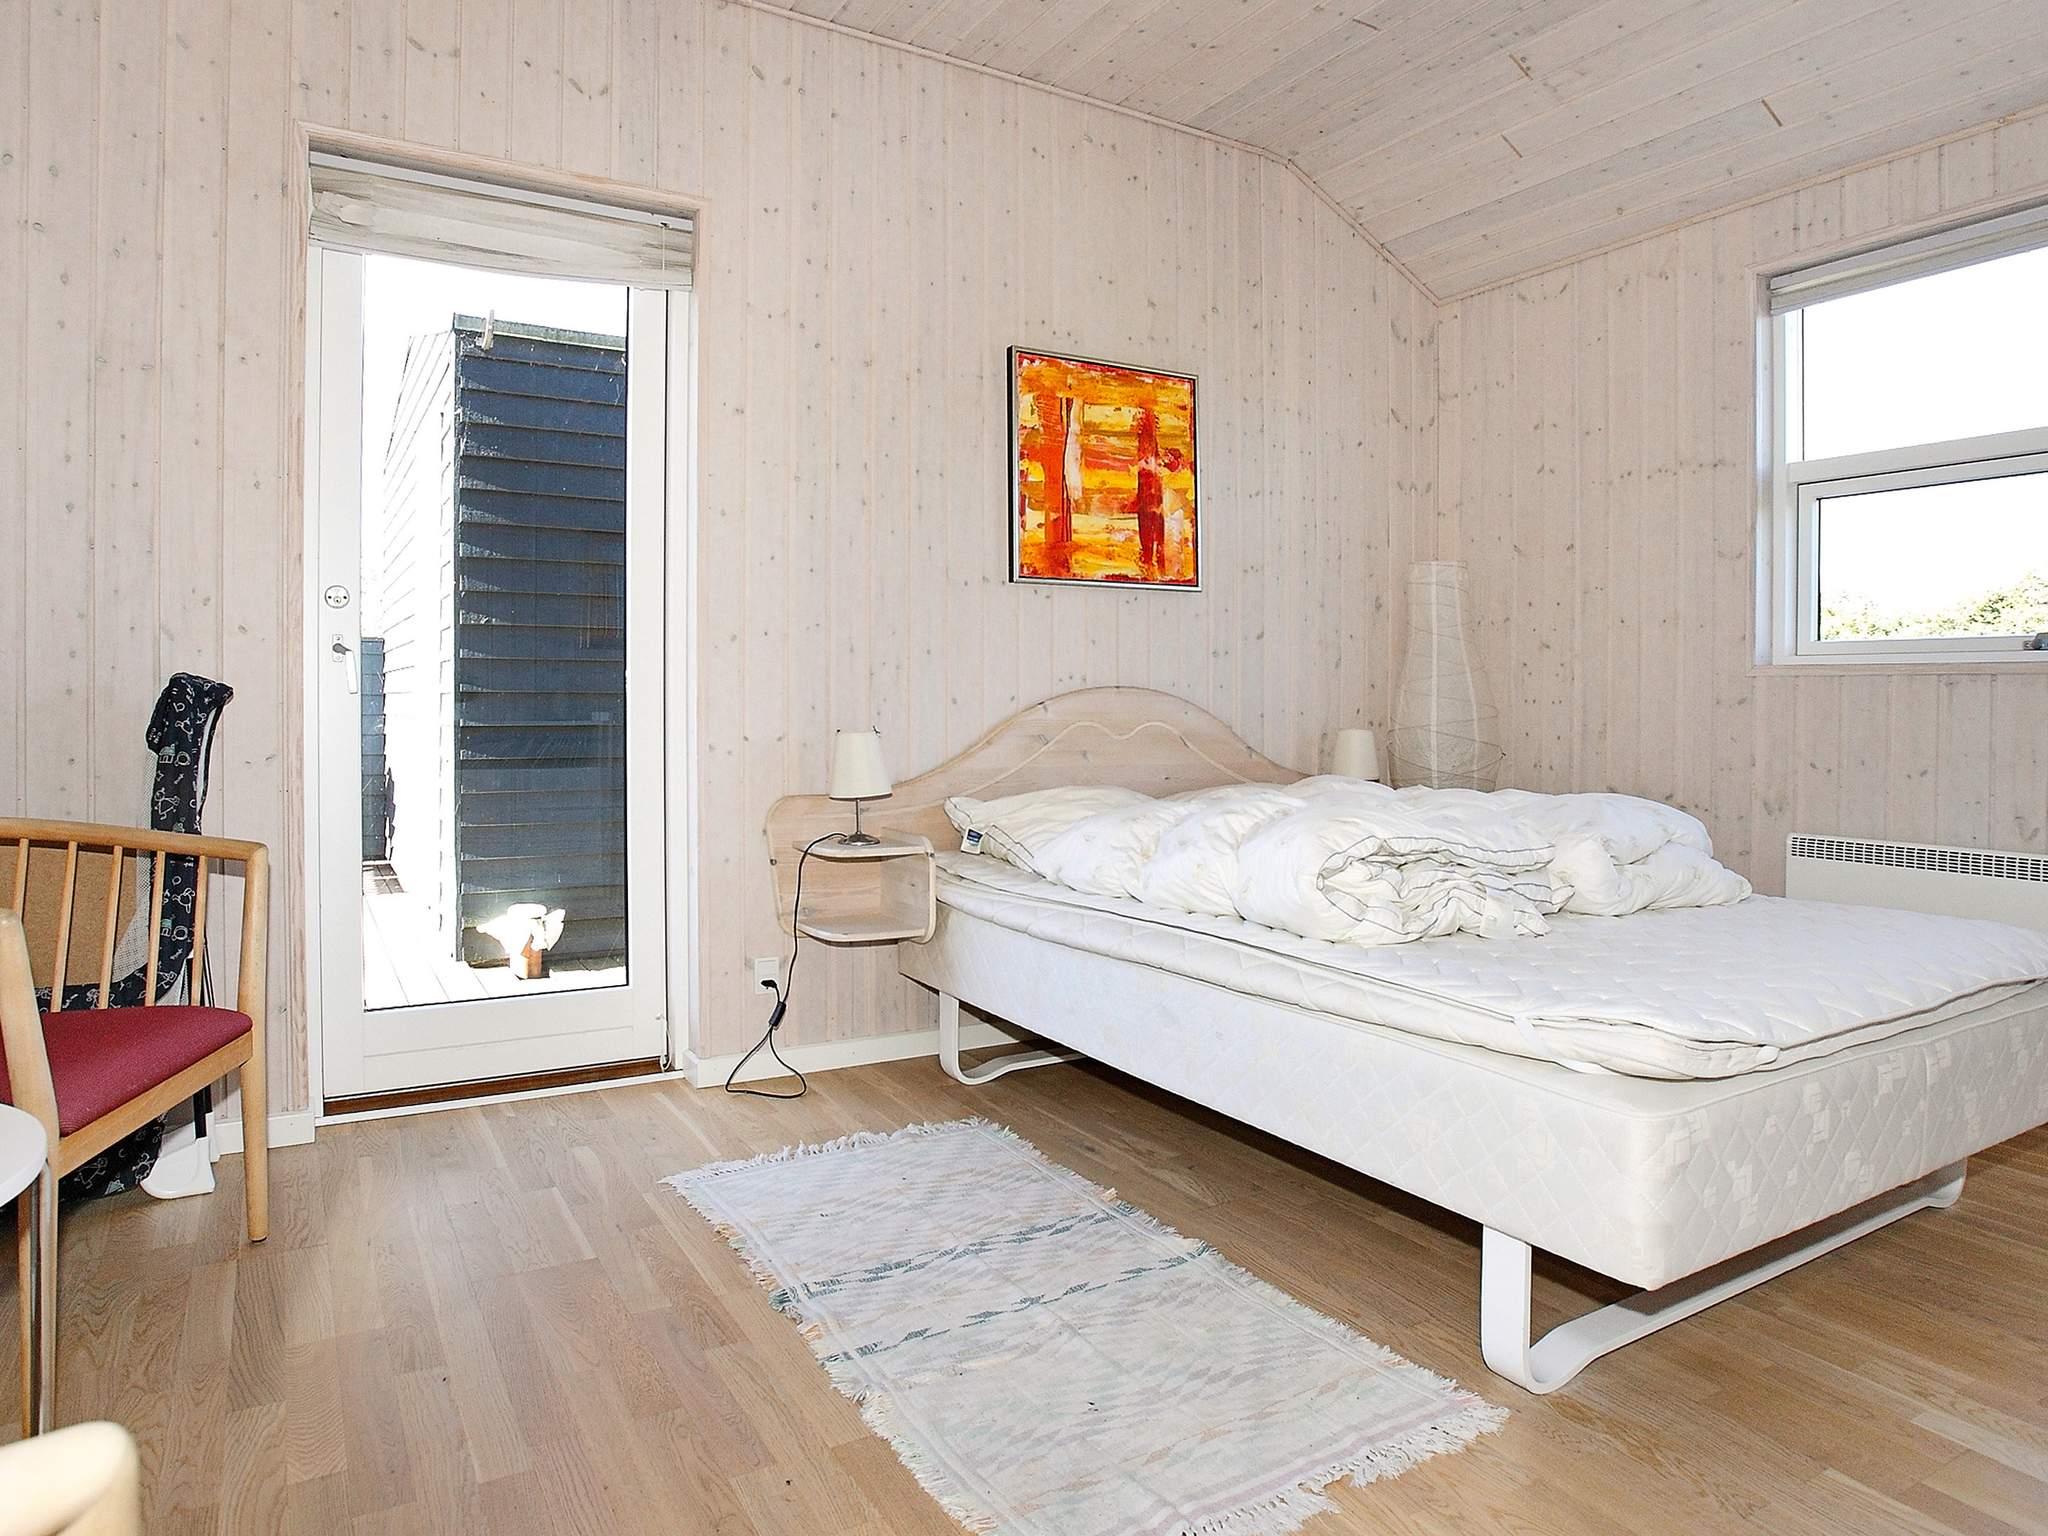 Ferienhaus Øster Hurup (318785), Øster Hurup, , Dänische Ostsee, Dänemark, Bild 9